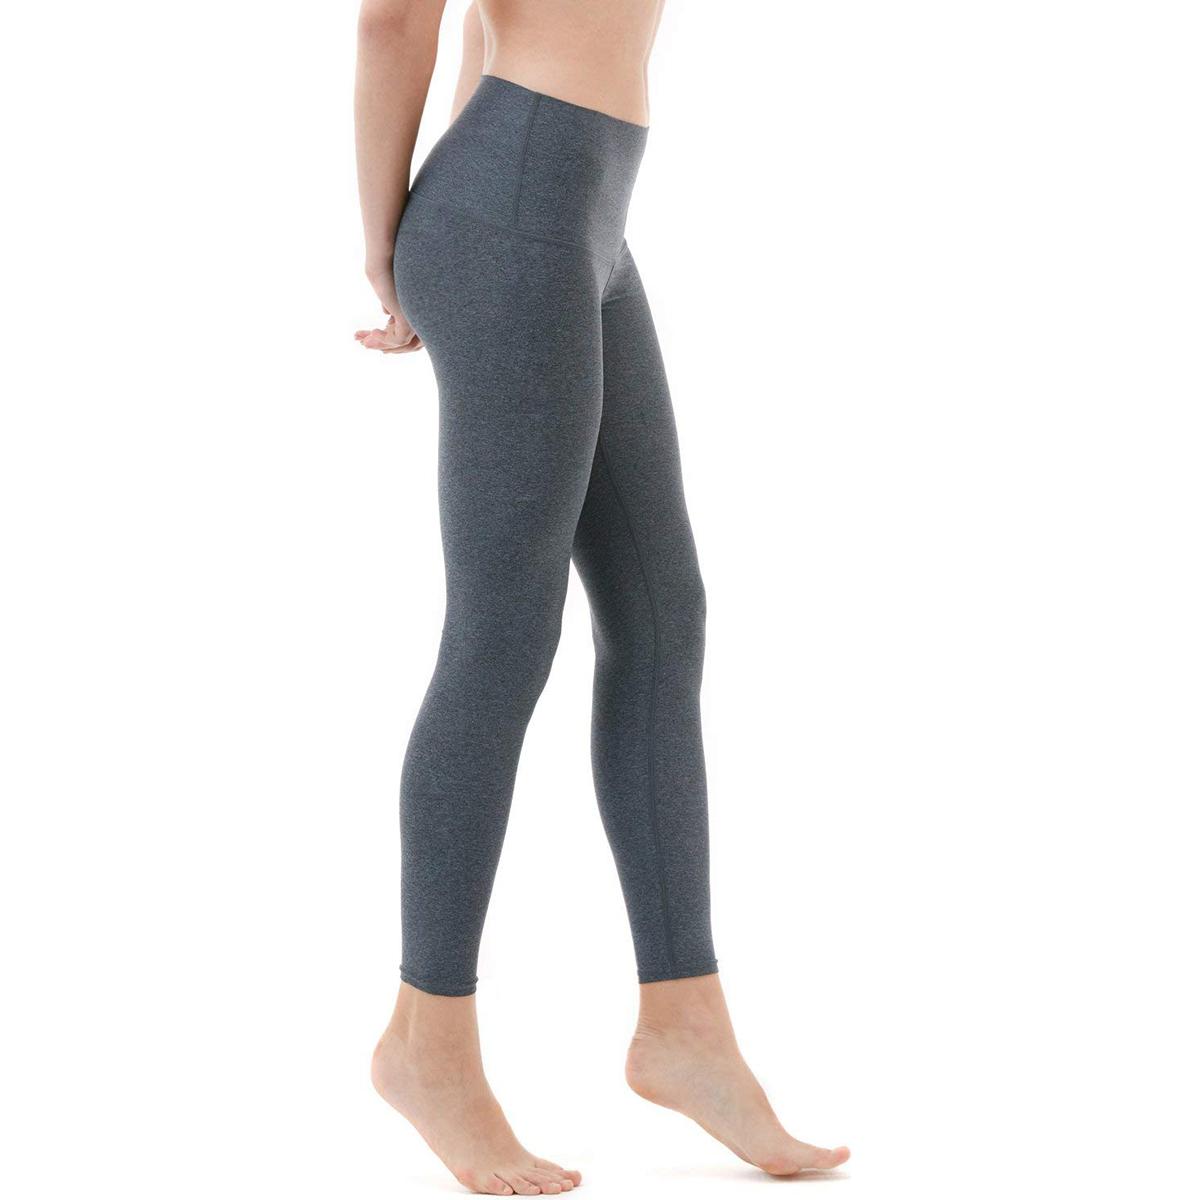 thumbnail 6 - TSLA Tesla FYP52 Women's High-Waisted Ultra-Stretch Tummy Control Yoga Pants